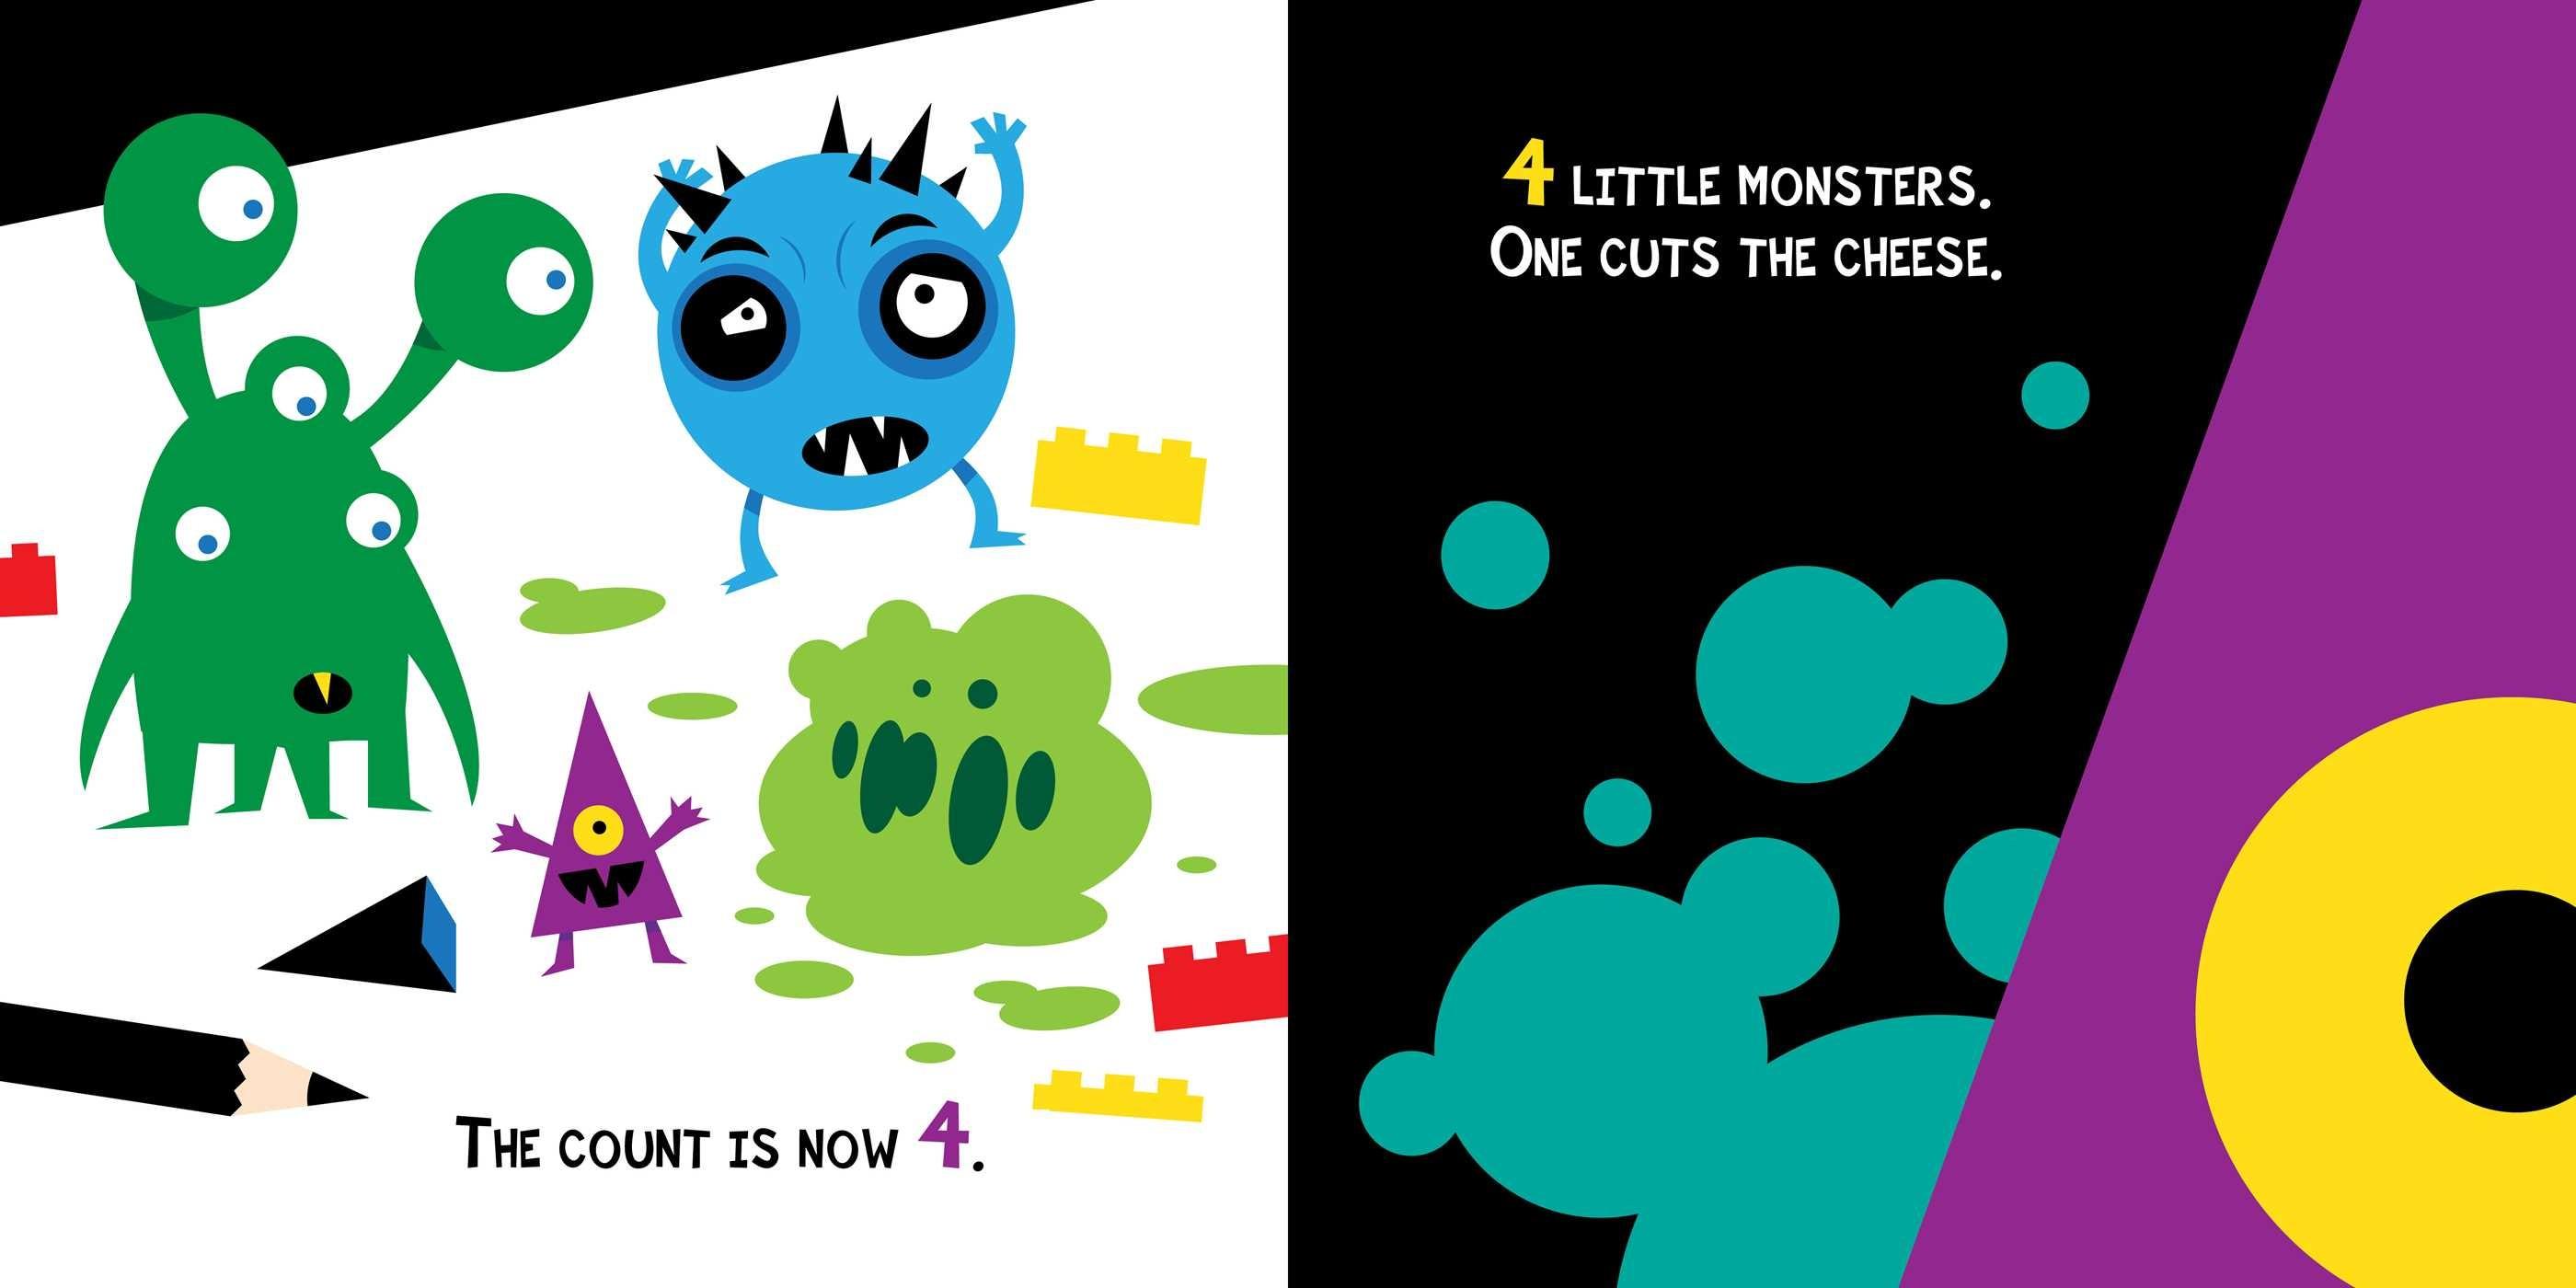 One little monster 9781534406742.in06